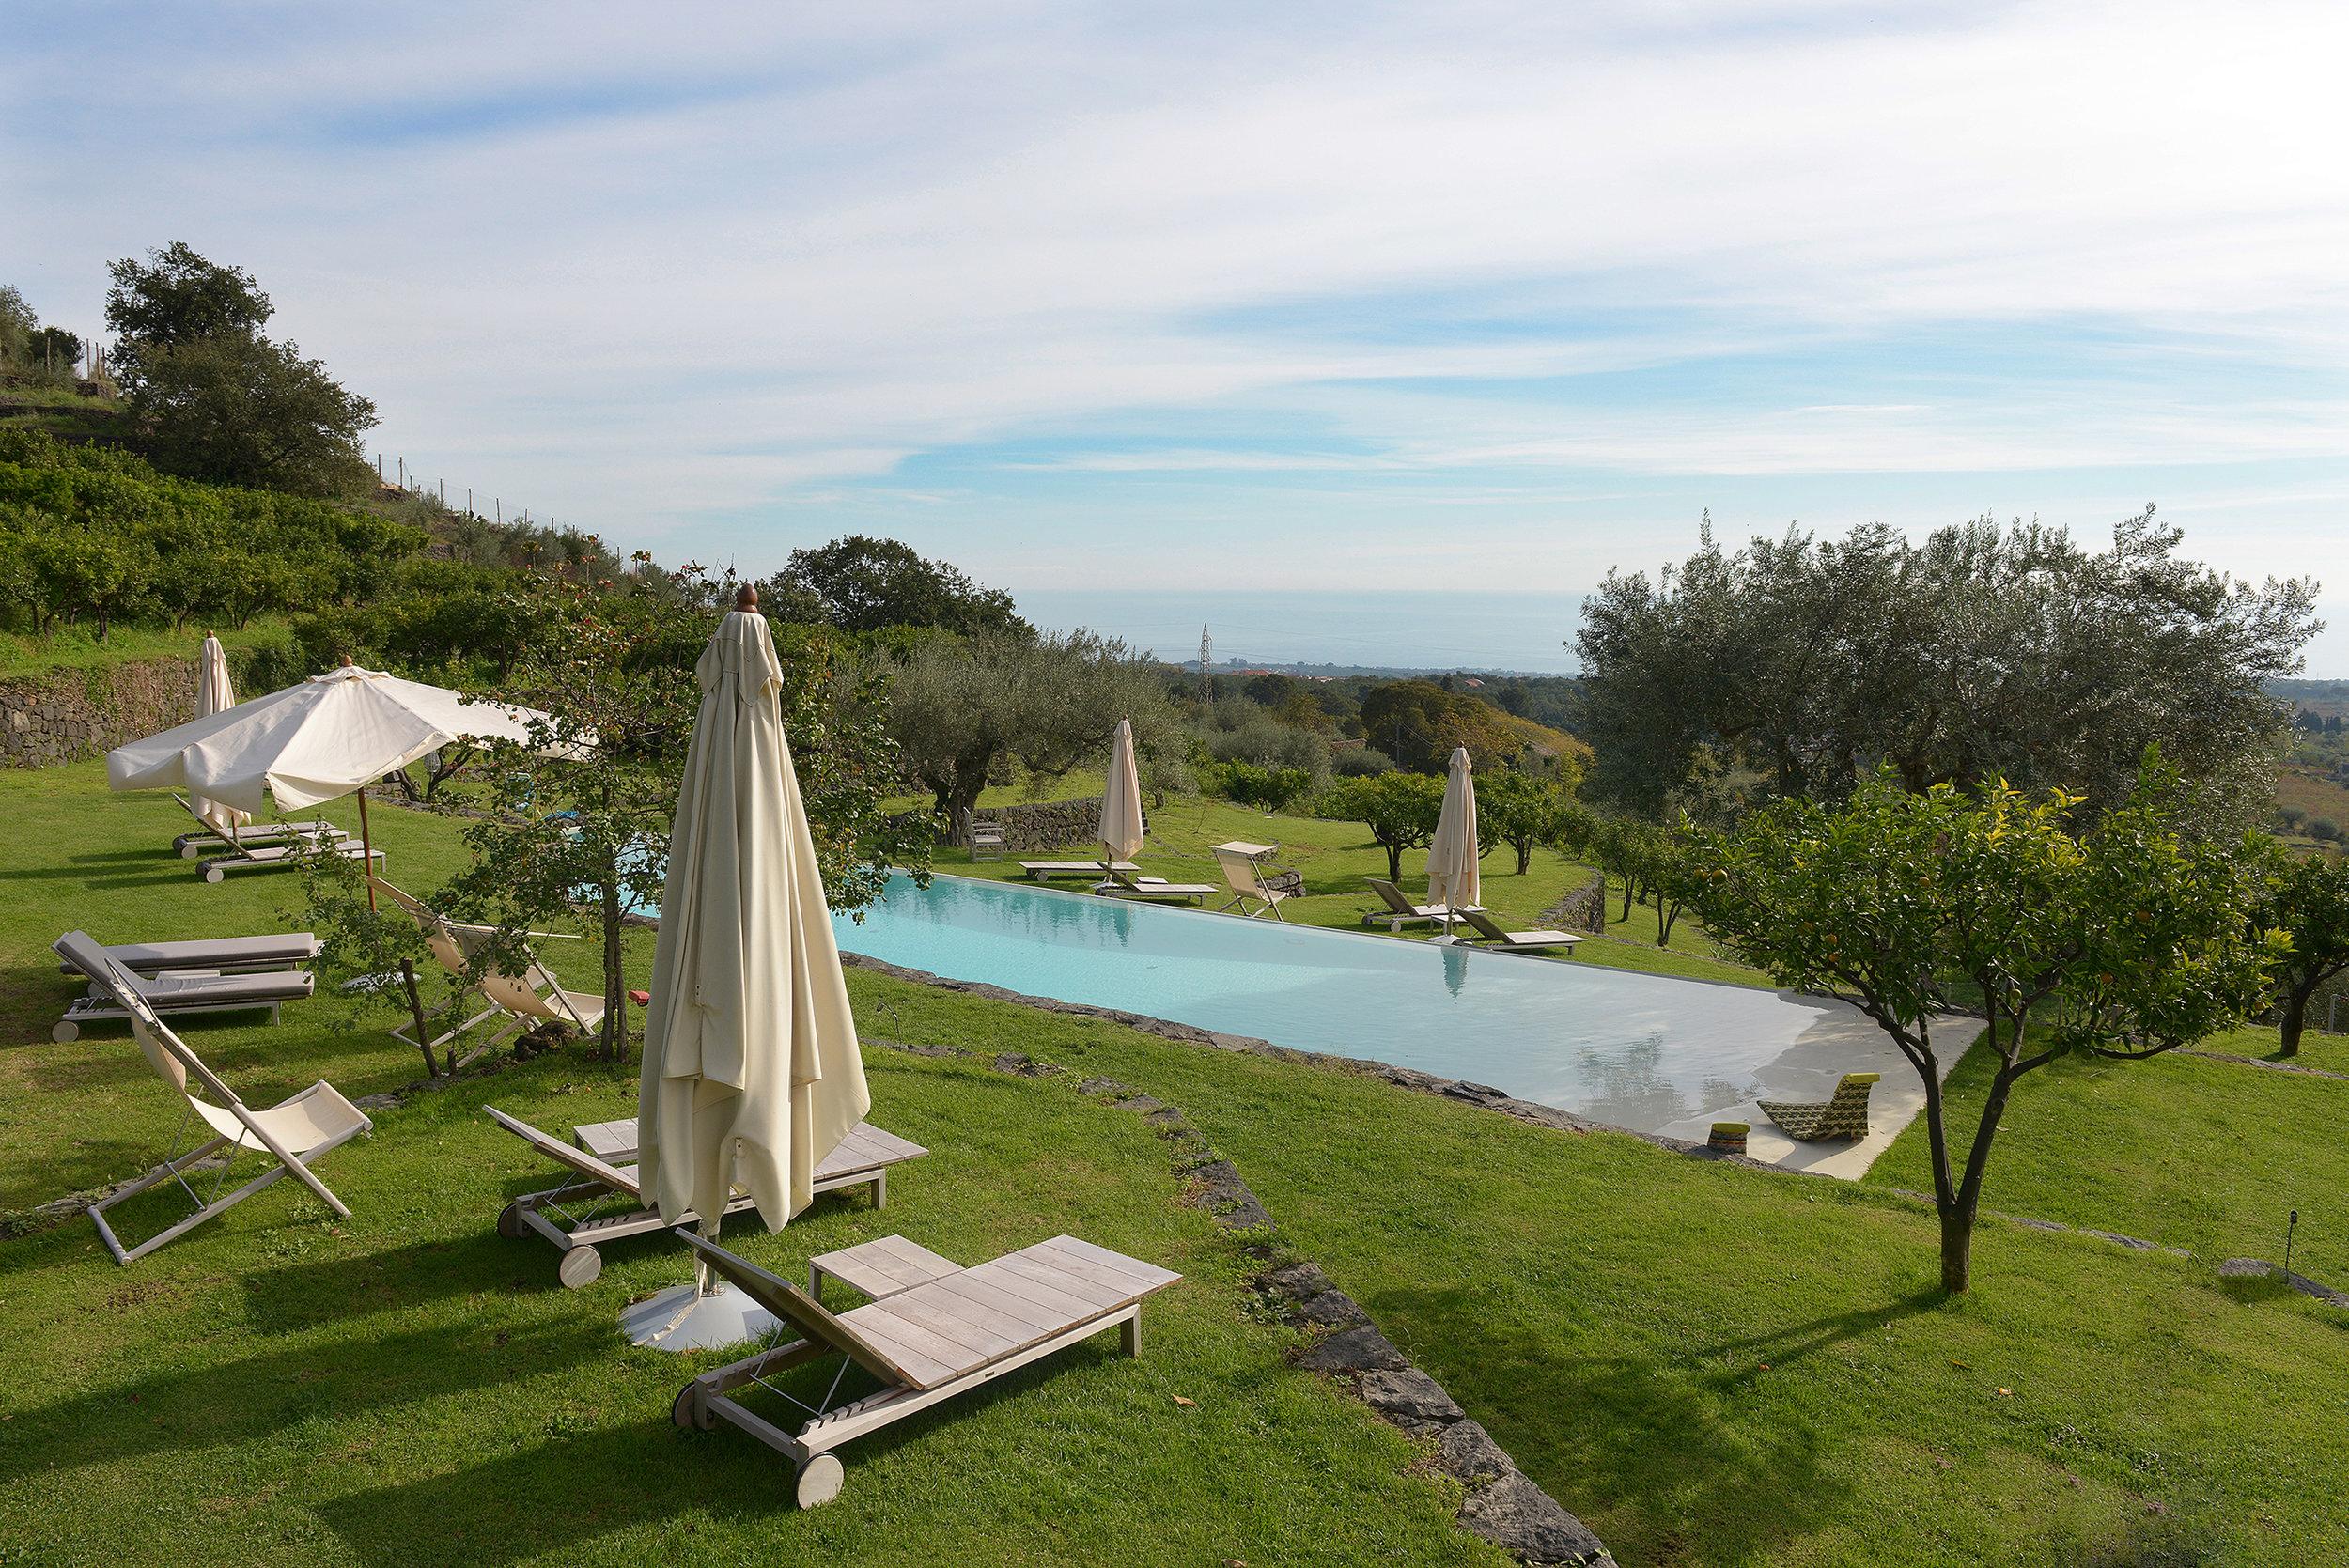 Italia, Sisilia, Monaci delle Terre Nere, viinitila, maaseutuhotelli, agriturismo